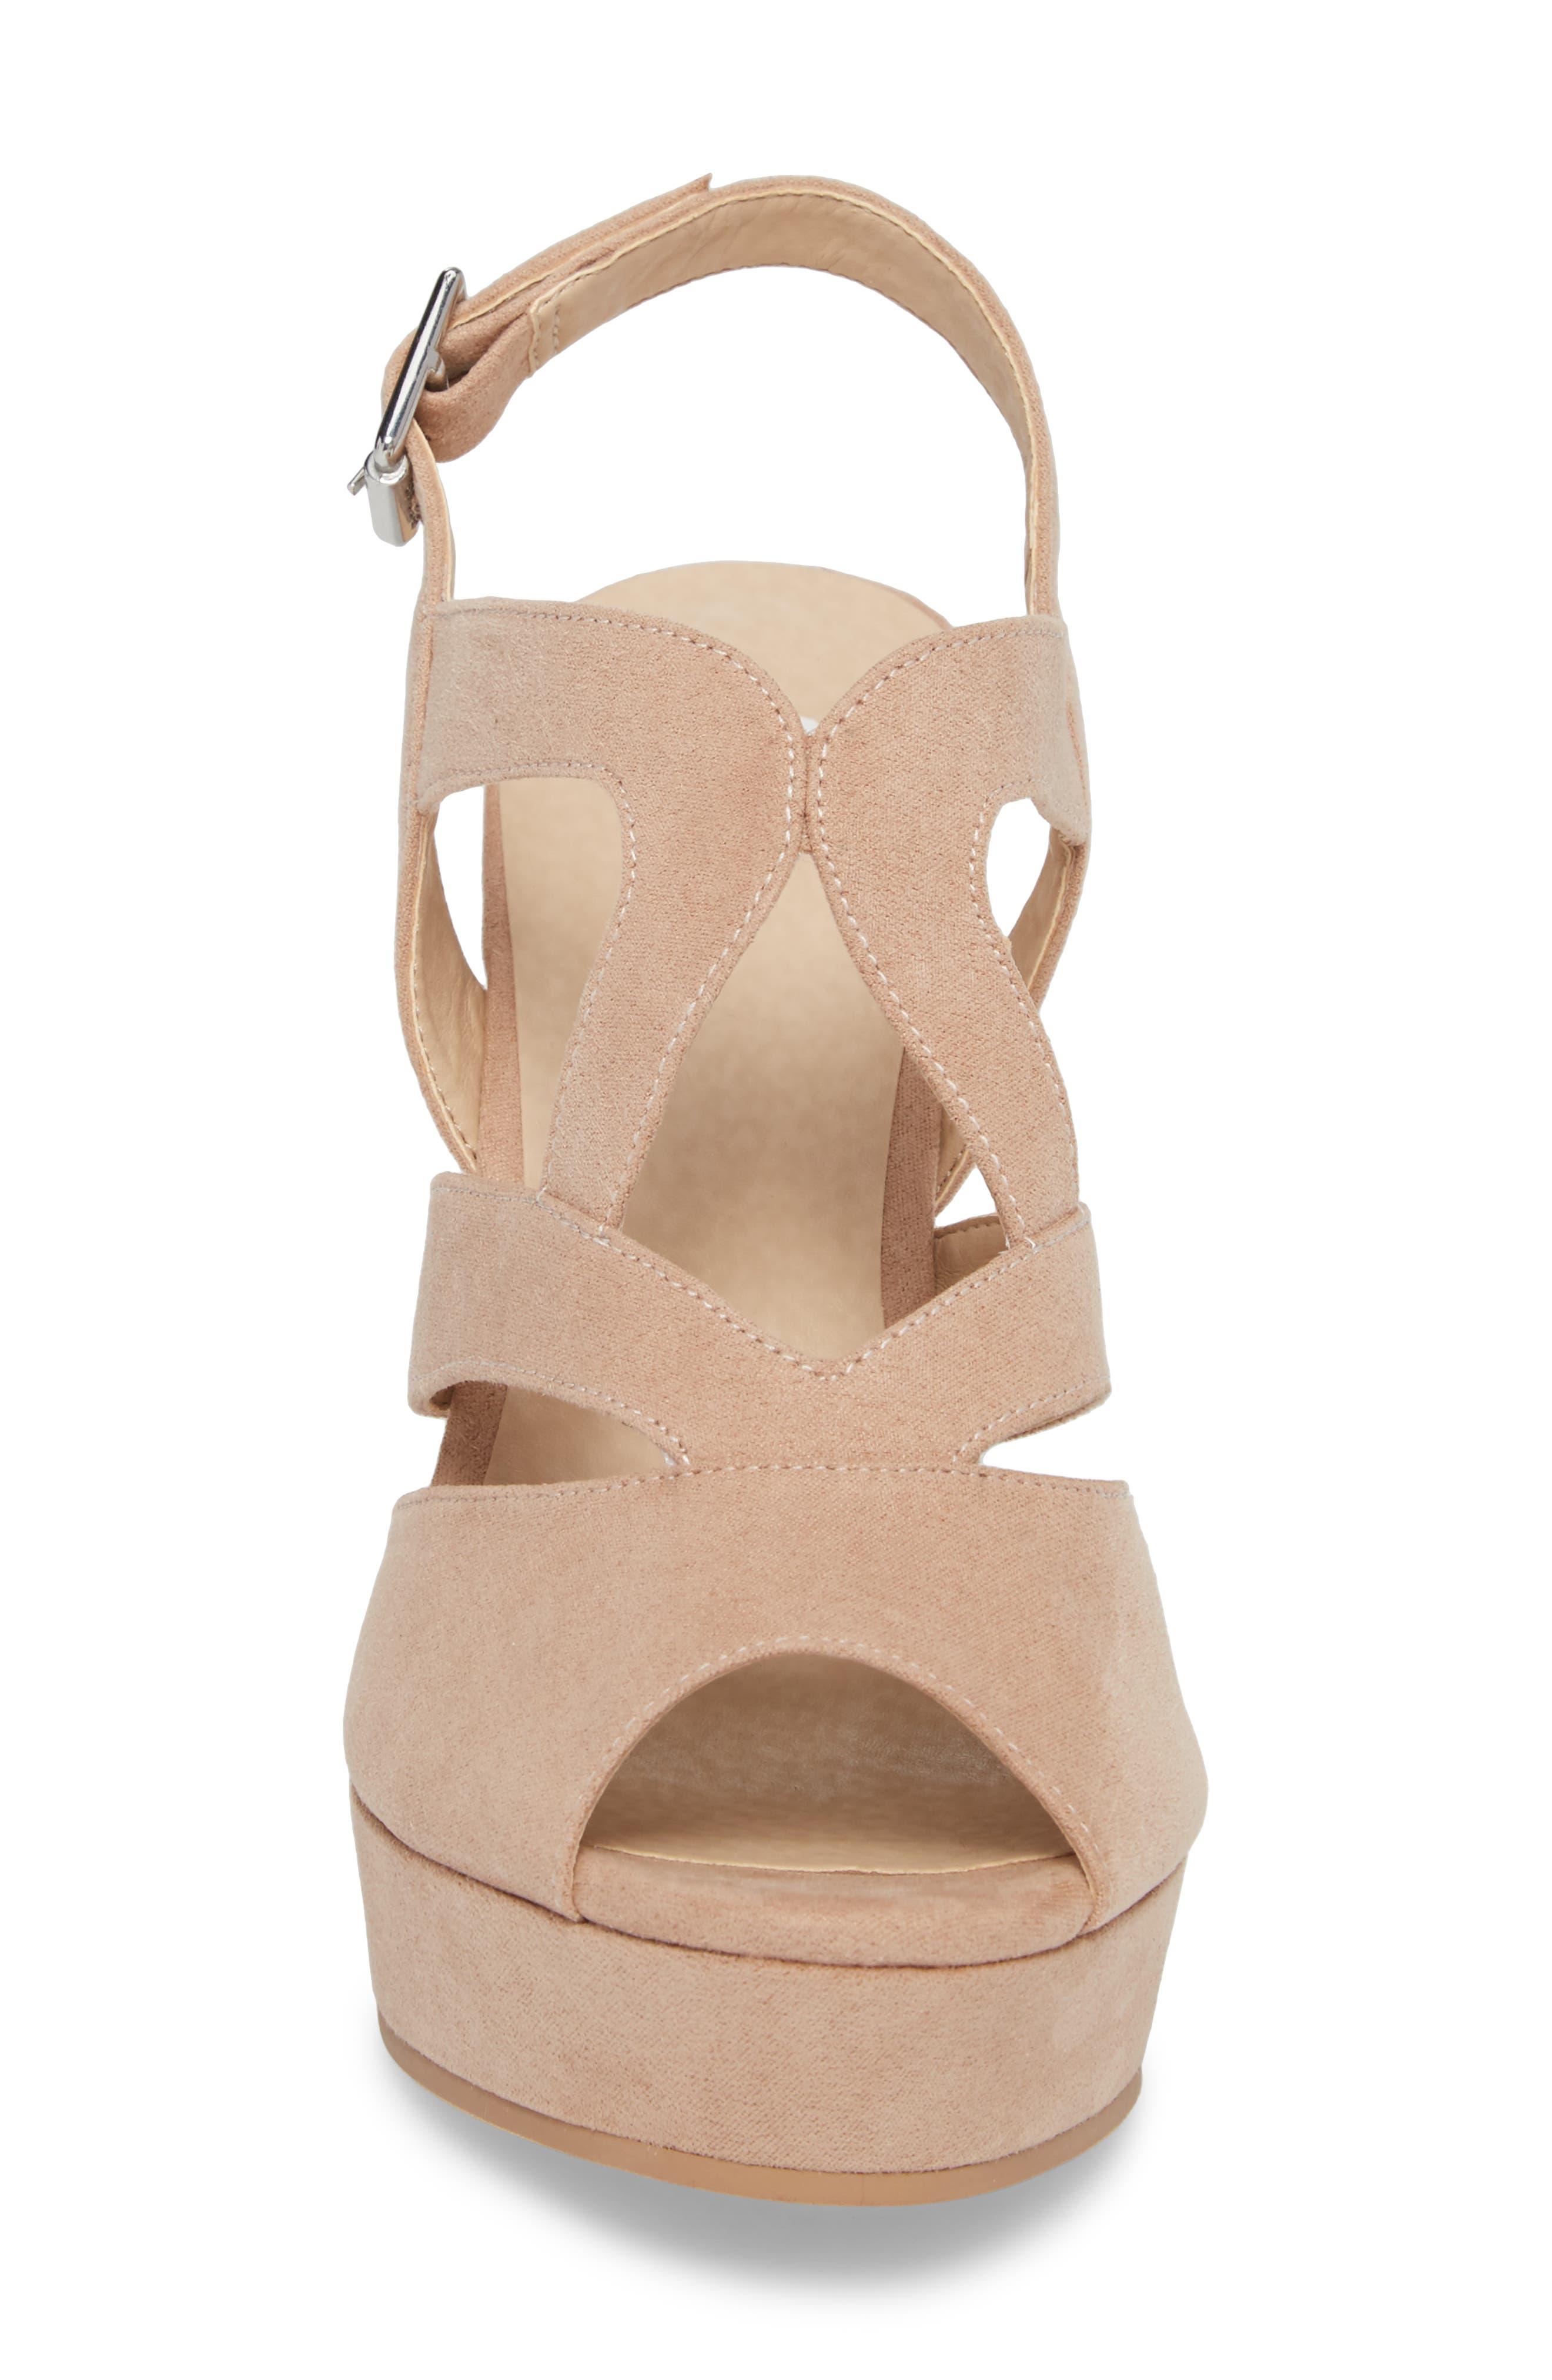 Sunny Platform Wedge Sandal,                             Alternate thumbnail 4, color,                             Nude Faux Suede